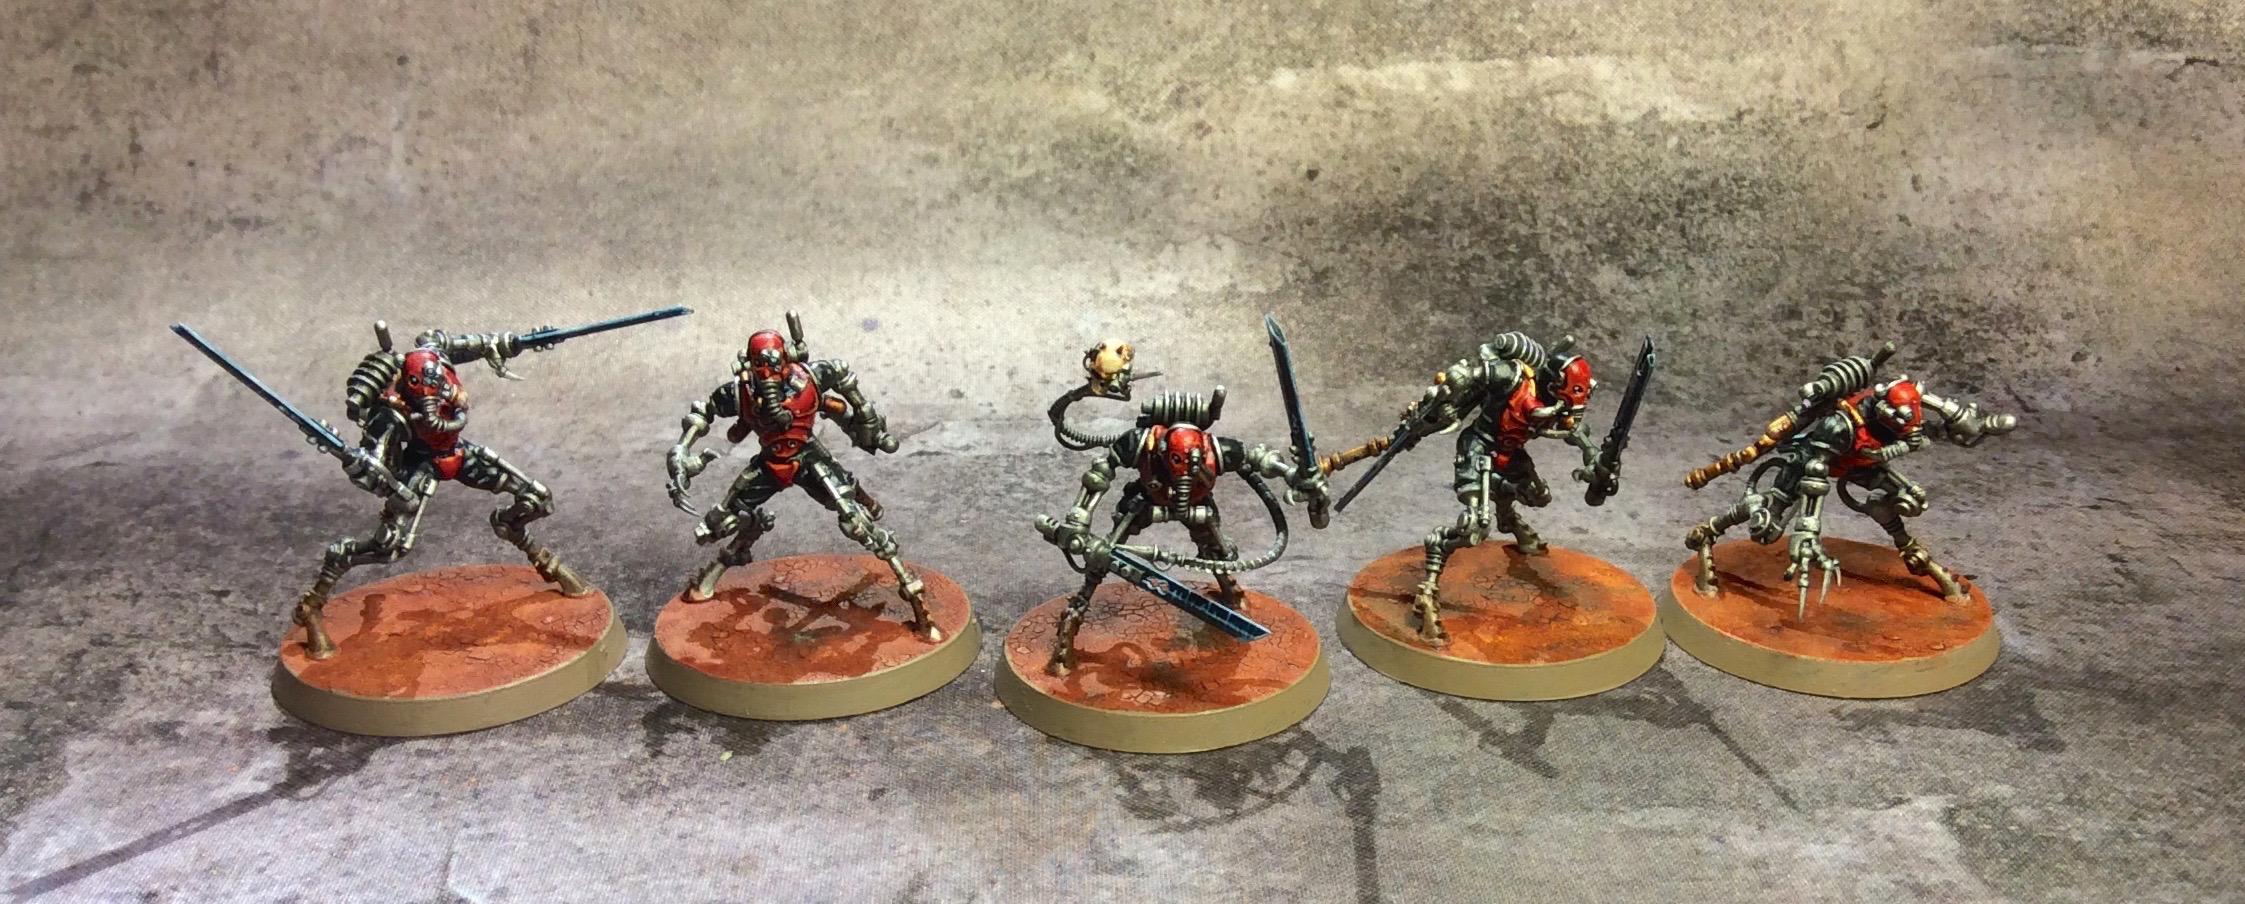 Adeptus Mechanicus, Riccardo Margarolo, Rustalker, Skitarii